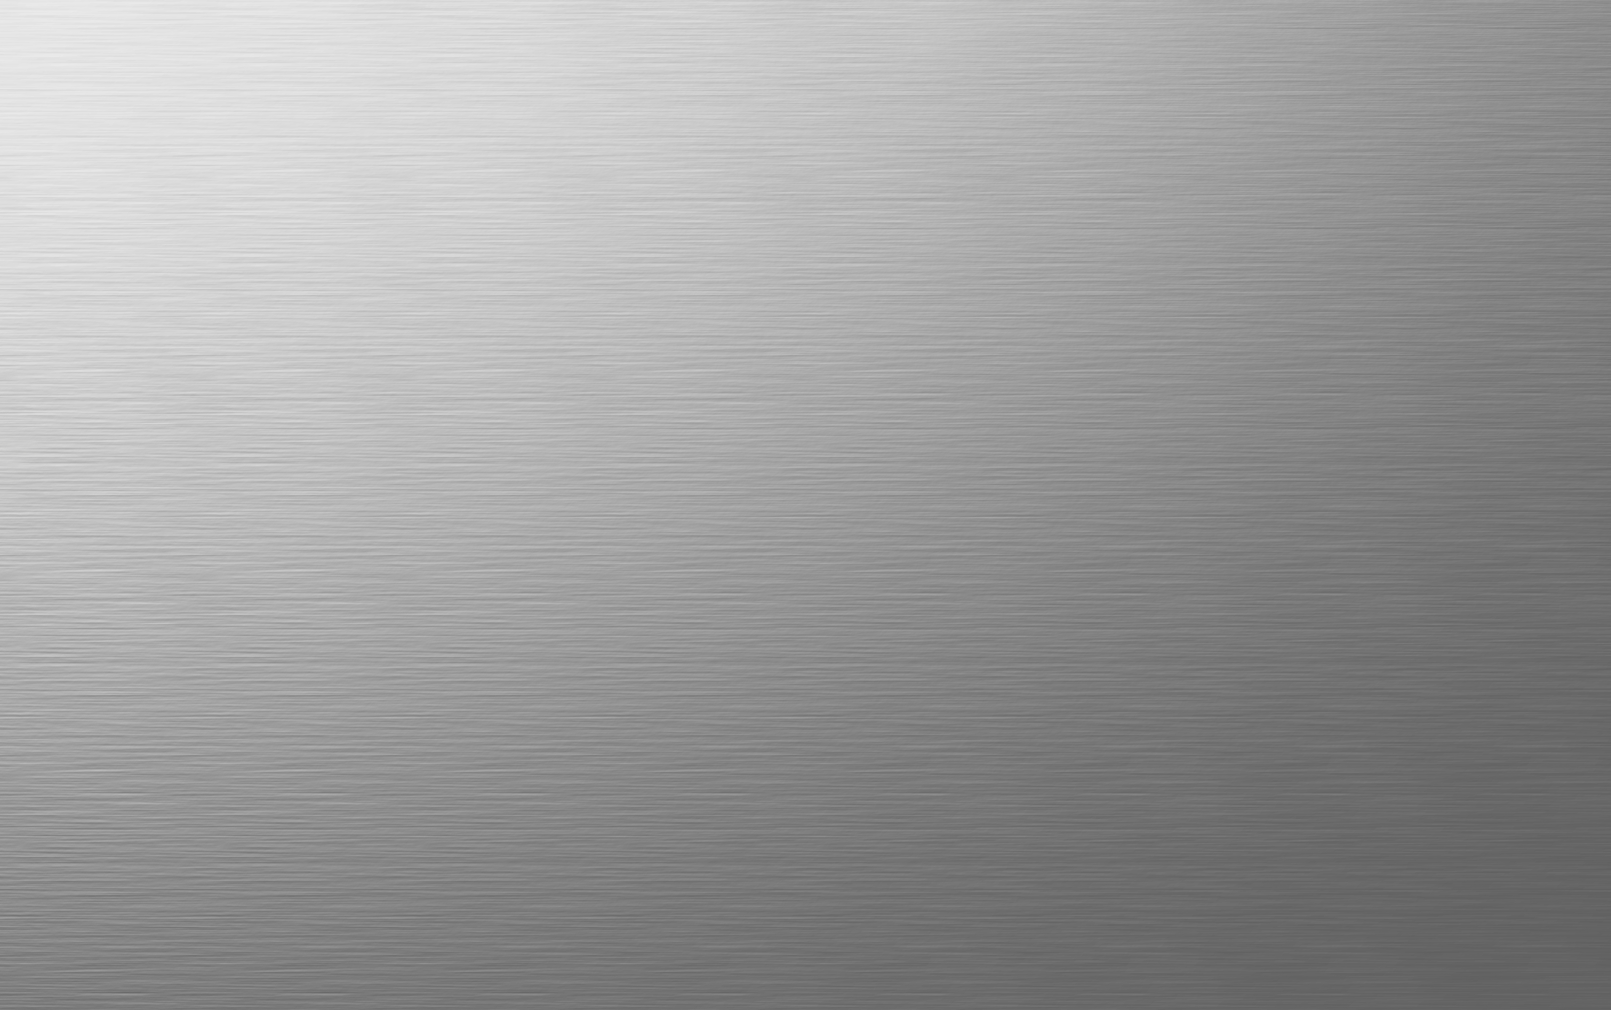 brushed aluminum wallpapers wallpaper cave. Black Bedroom Furniture Sets. Home Design Ideas